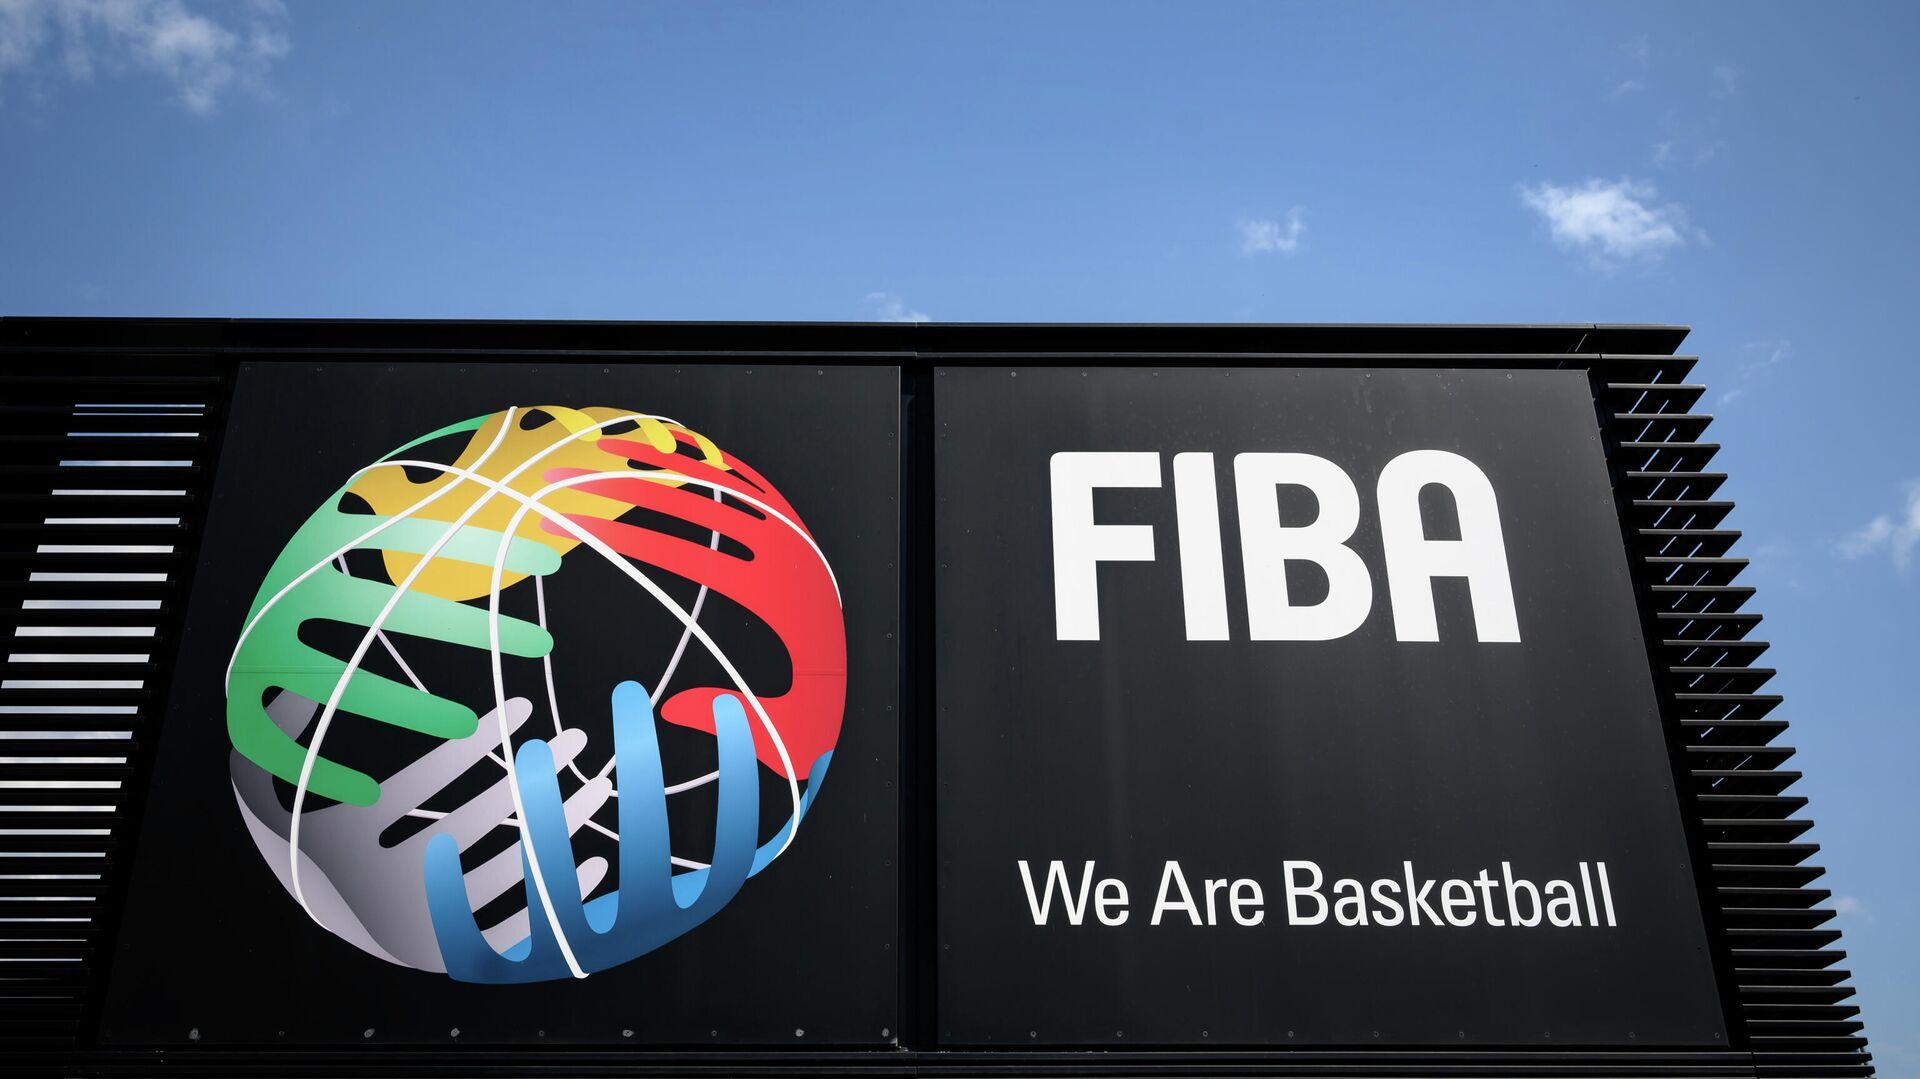 Логотип FIBA - РИА Новости, 1920, 24.09.2020